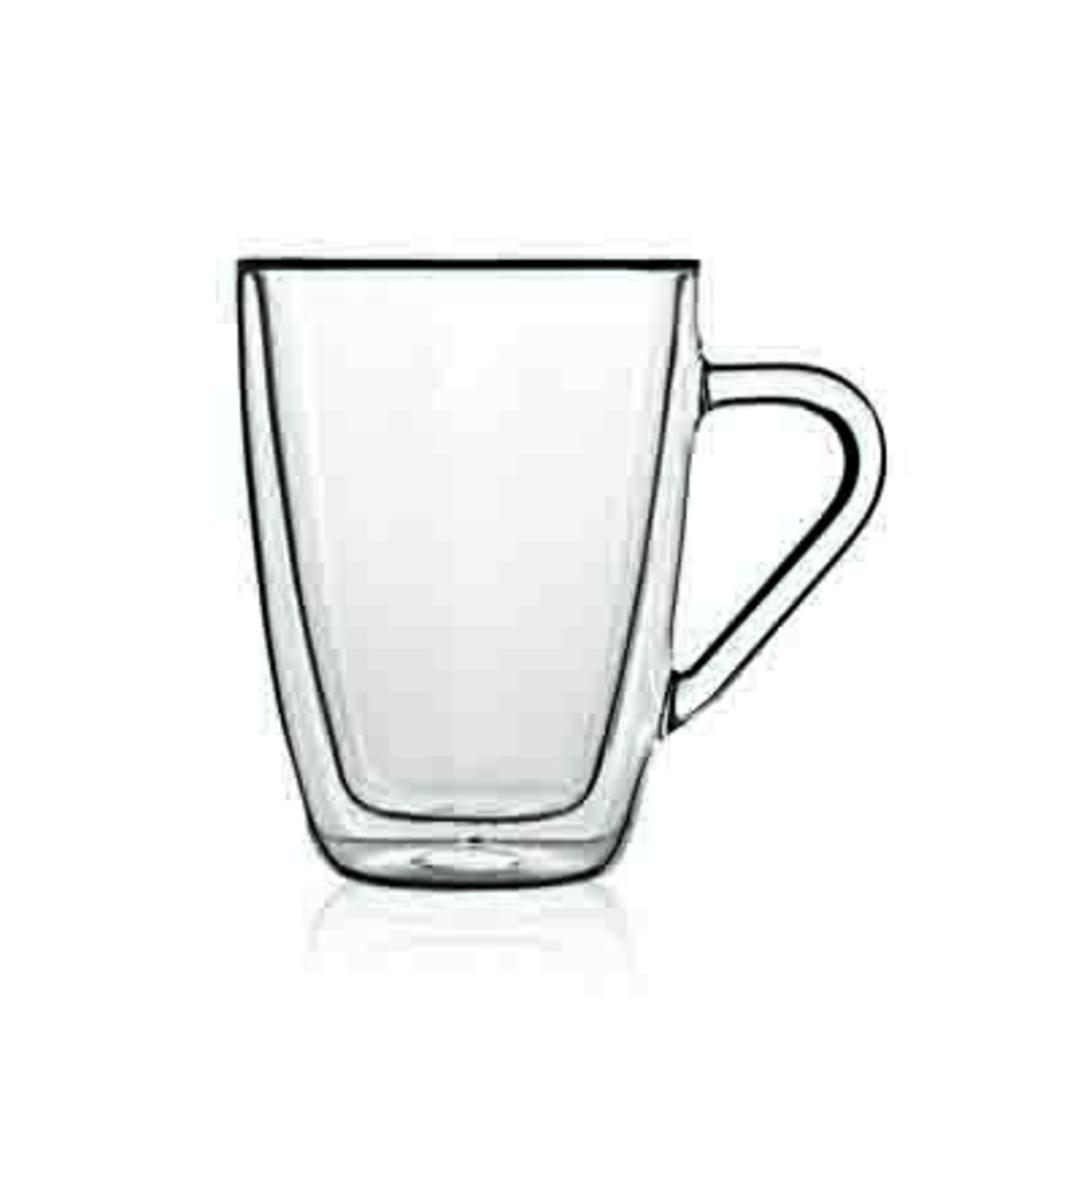 Mug rond transparent verre borosilicate 32 cl Ø 8,50 cm Thermic Glass Luigi Bormioli